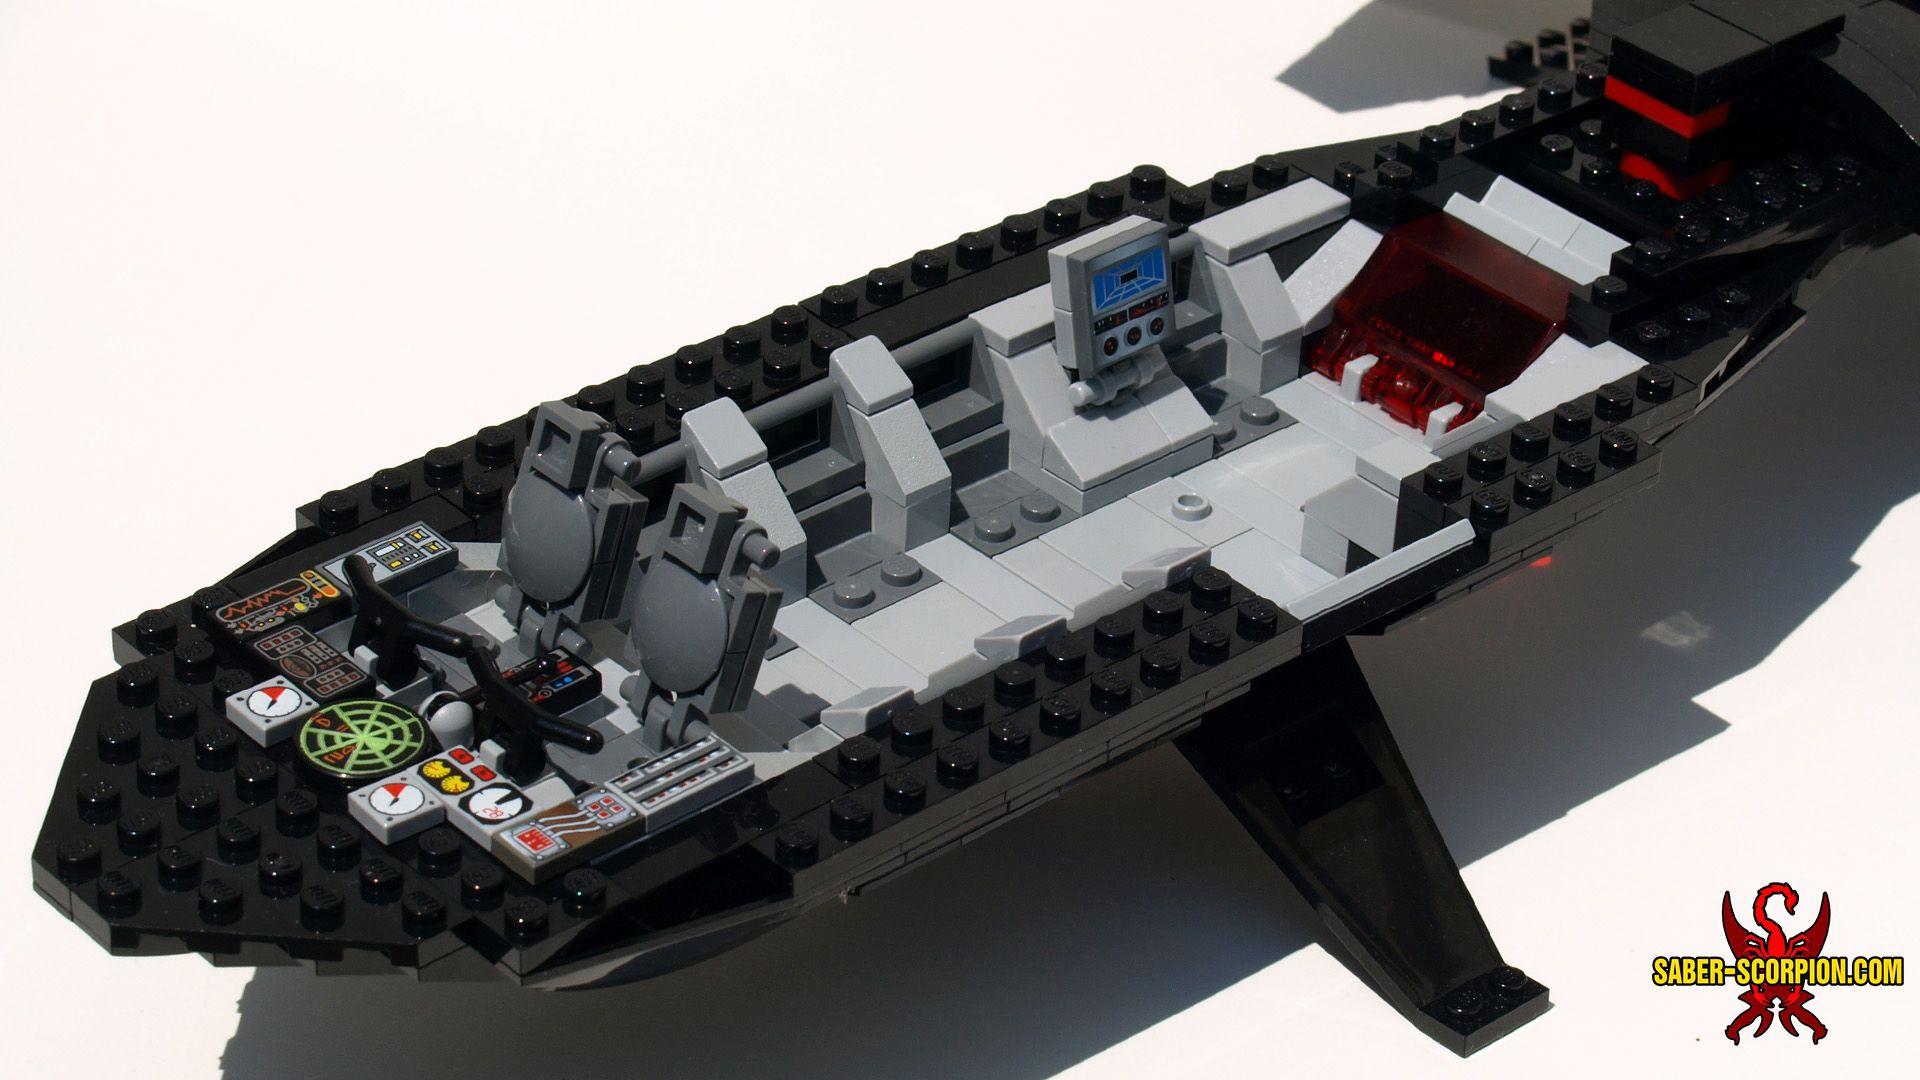 LEGO XMen XJet Blackbird MOC SaberScorpion's Lair